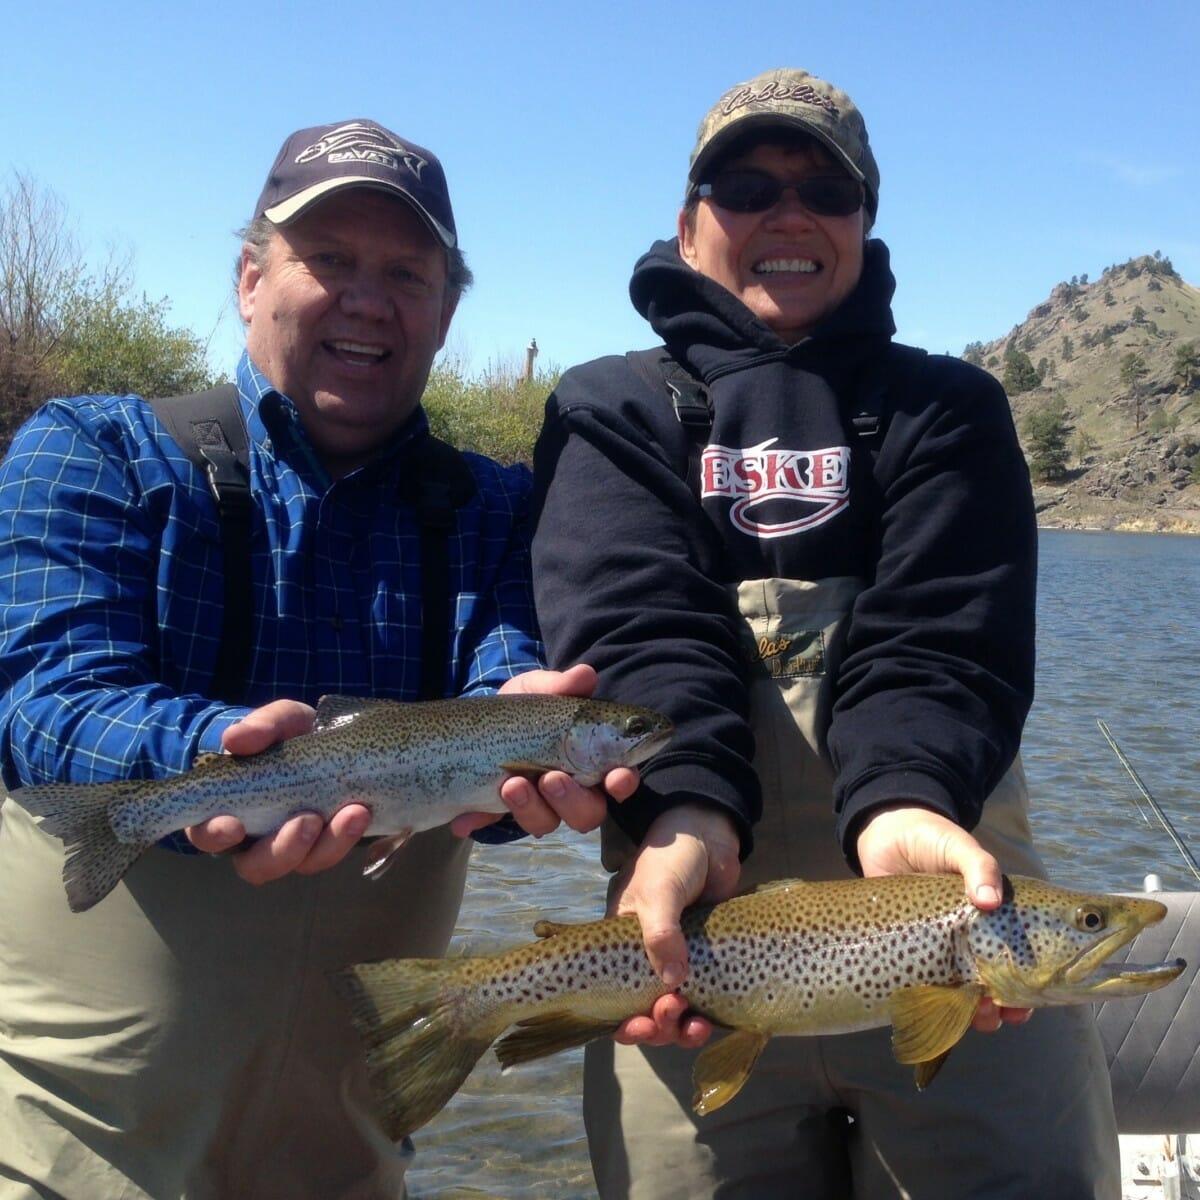 Late april missouri river fishing report 4 24 15 wolf for Missouri fishing report